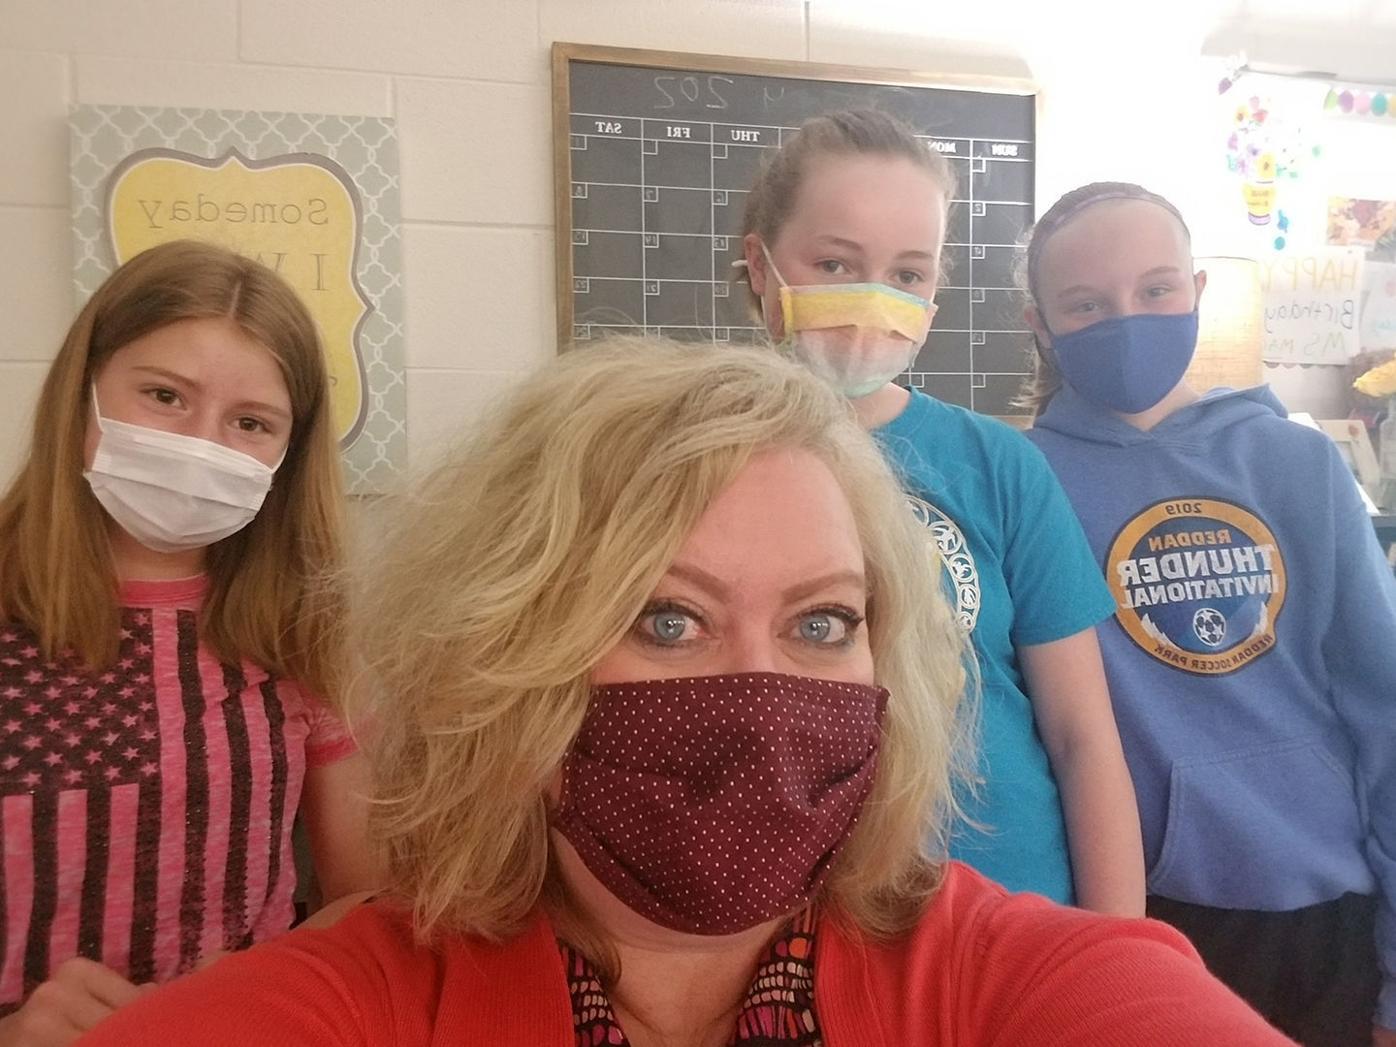 Magnor selfie w/ students